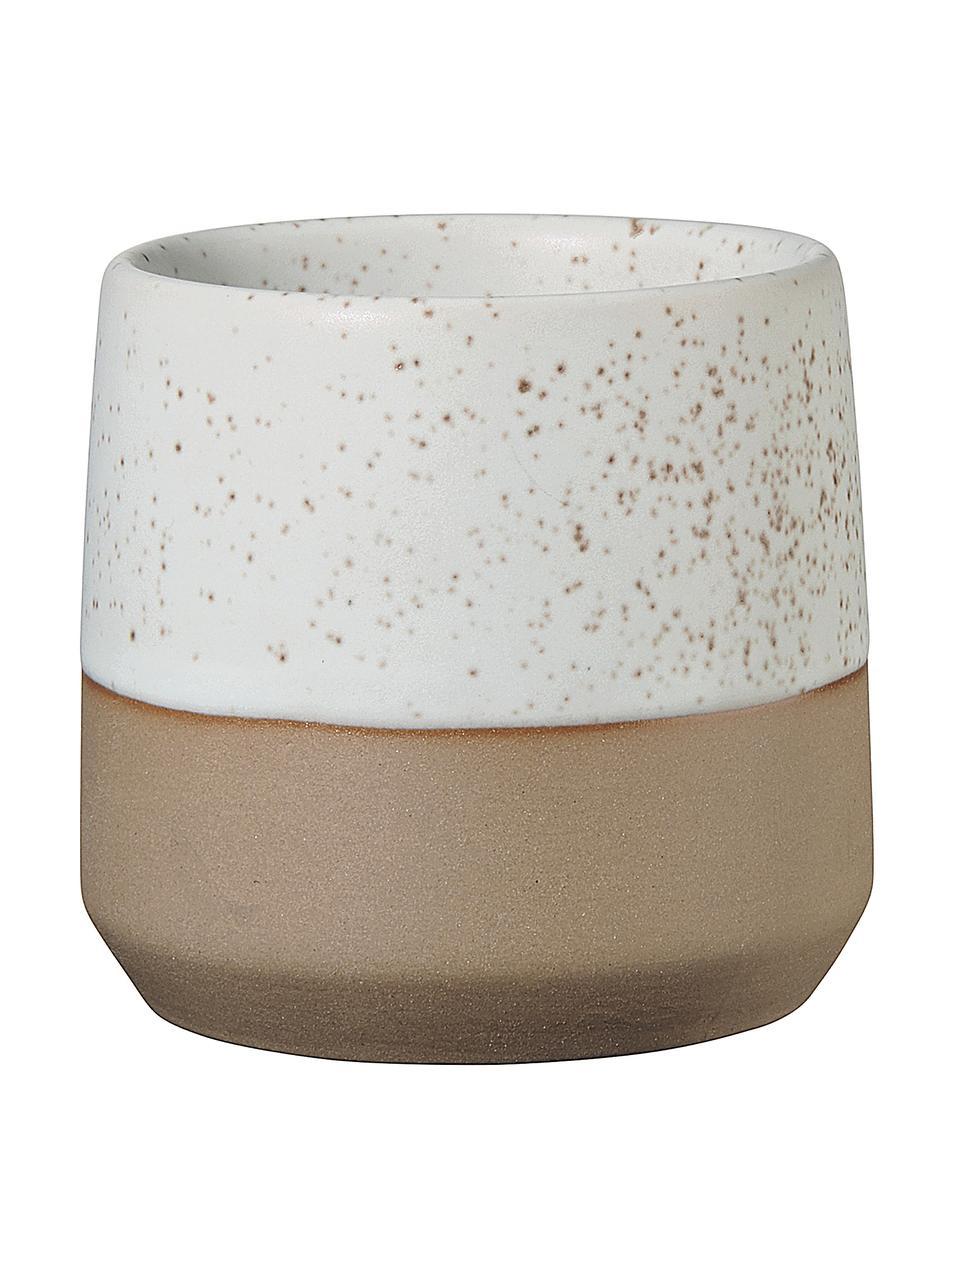 Tazza senza manico marrone/beige opaca Caja, Gres, Beige, marrone, Ø 7 x Alt. 7 cm